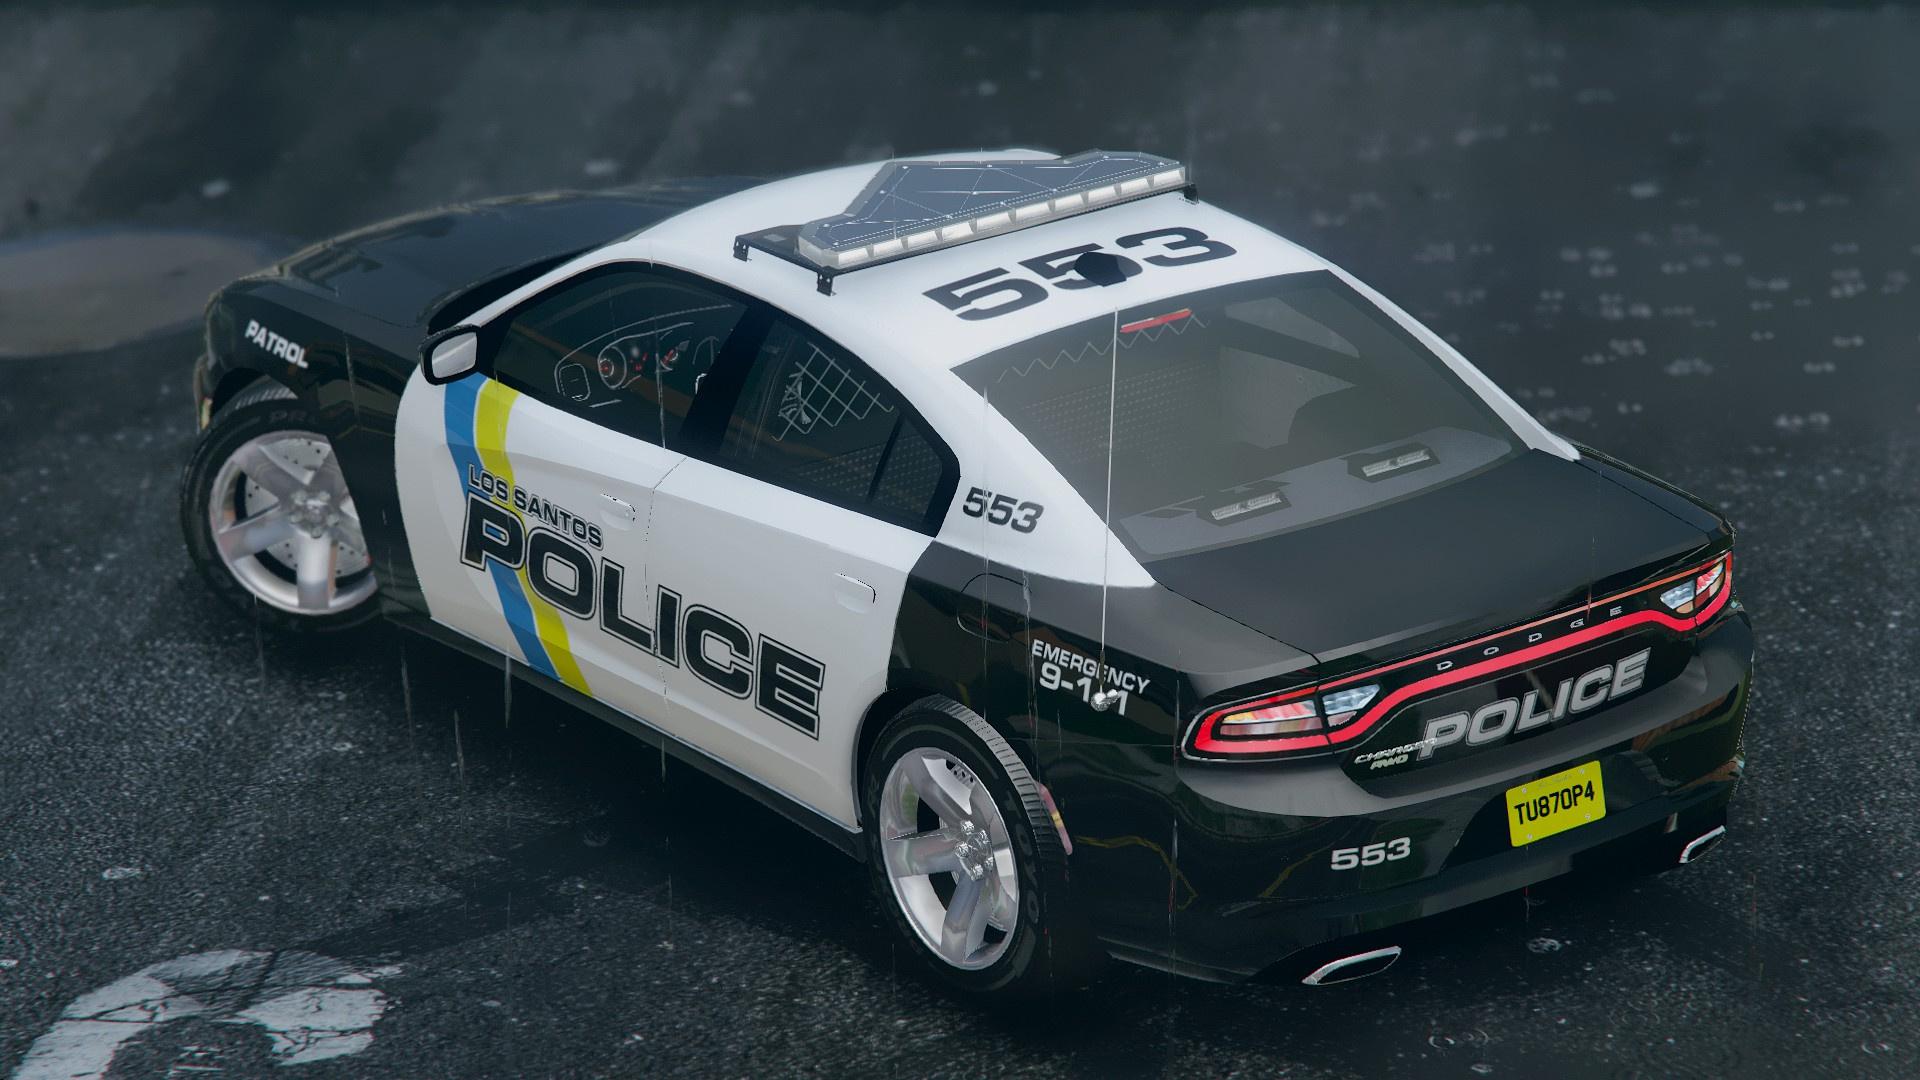 2015 Dodge Charger - Los Santos Police - GTA5-Mods.com 2015 Police Charger